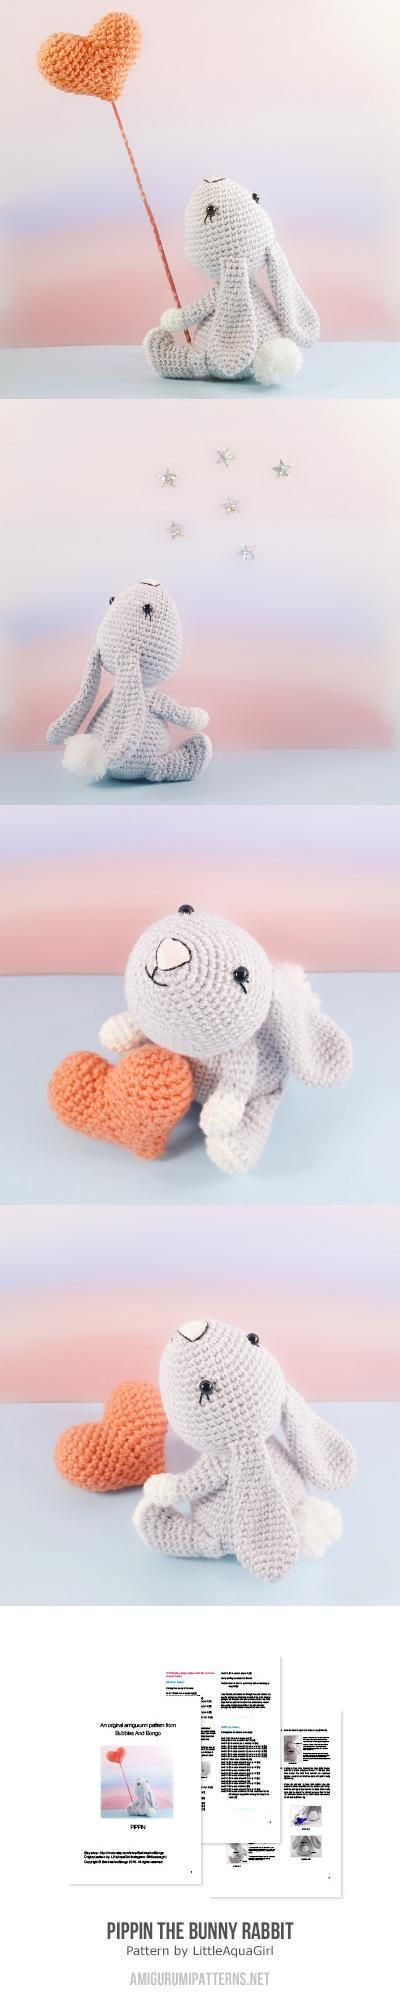 Pippin The Bunny Rabbit Amigurumi Pattern sweet